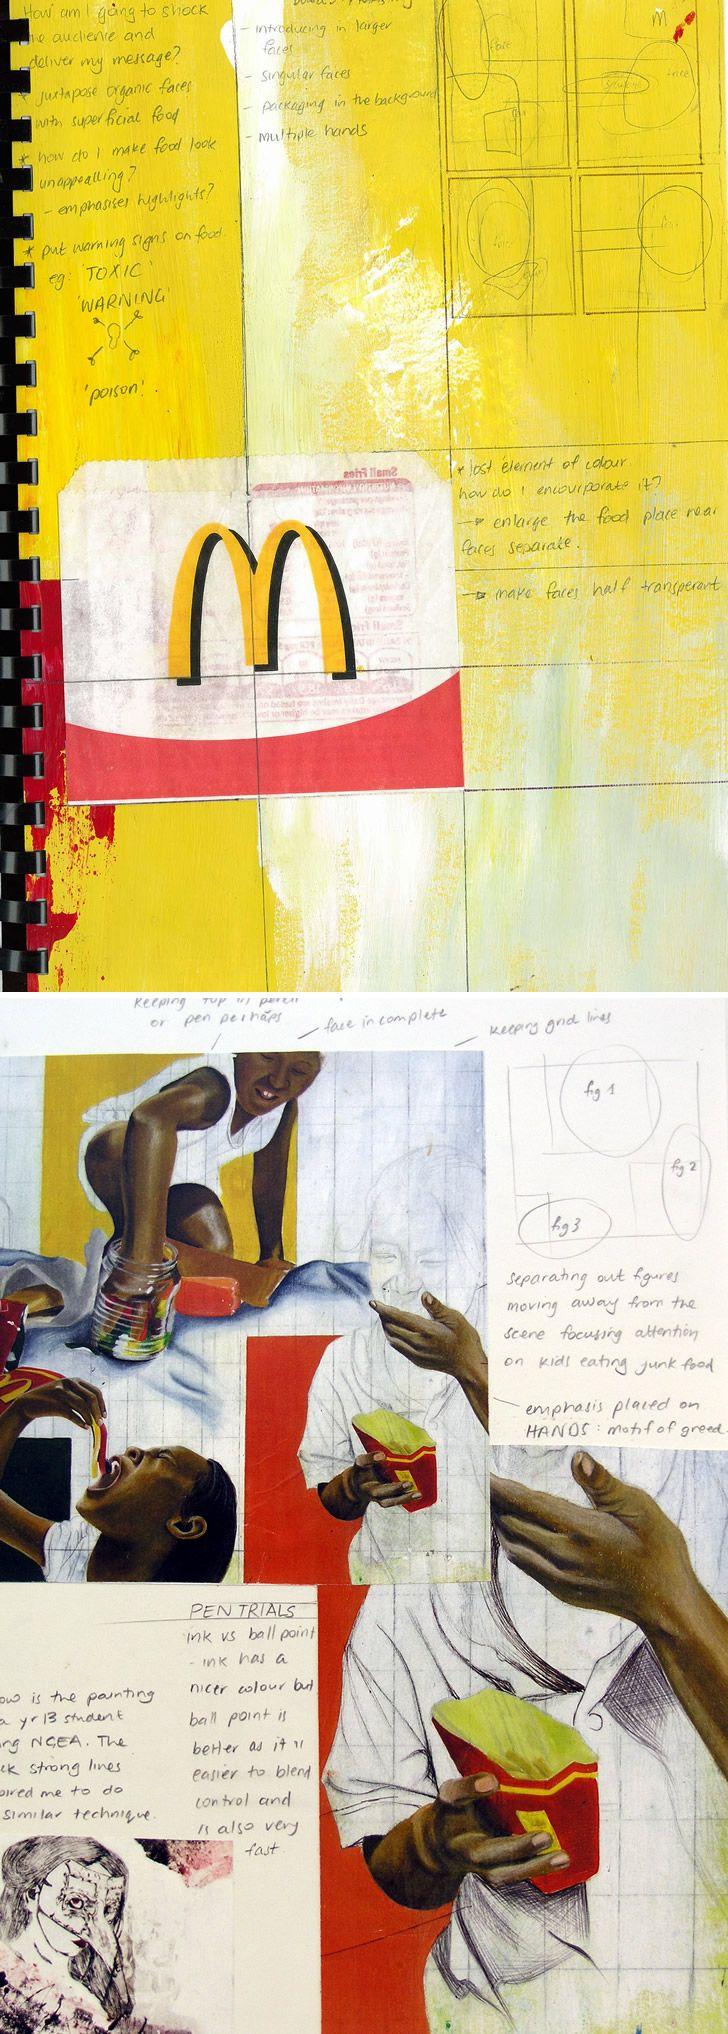 Art coursework help   Esthetician resume help Haikufeel